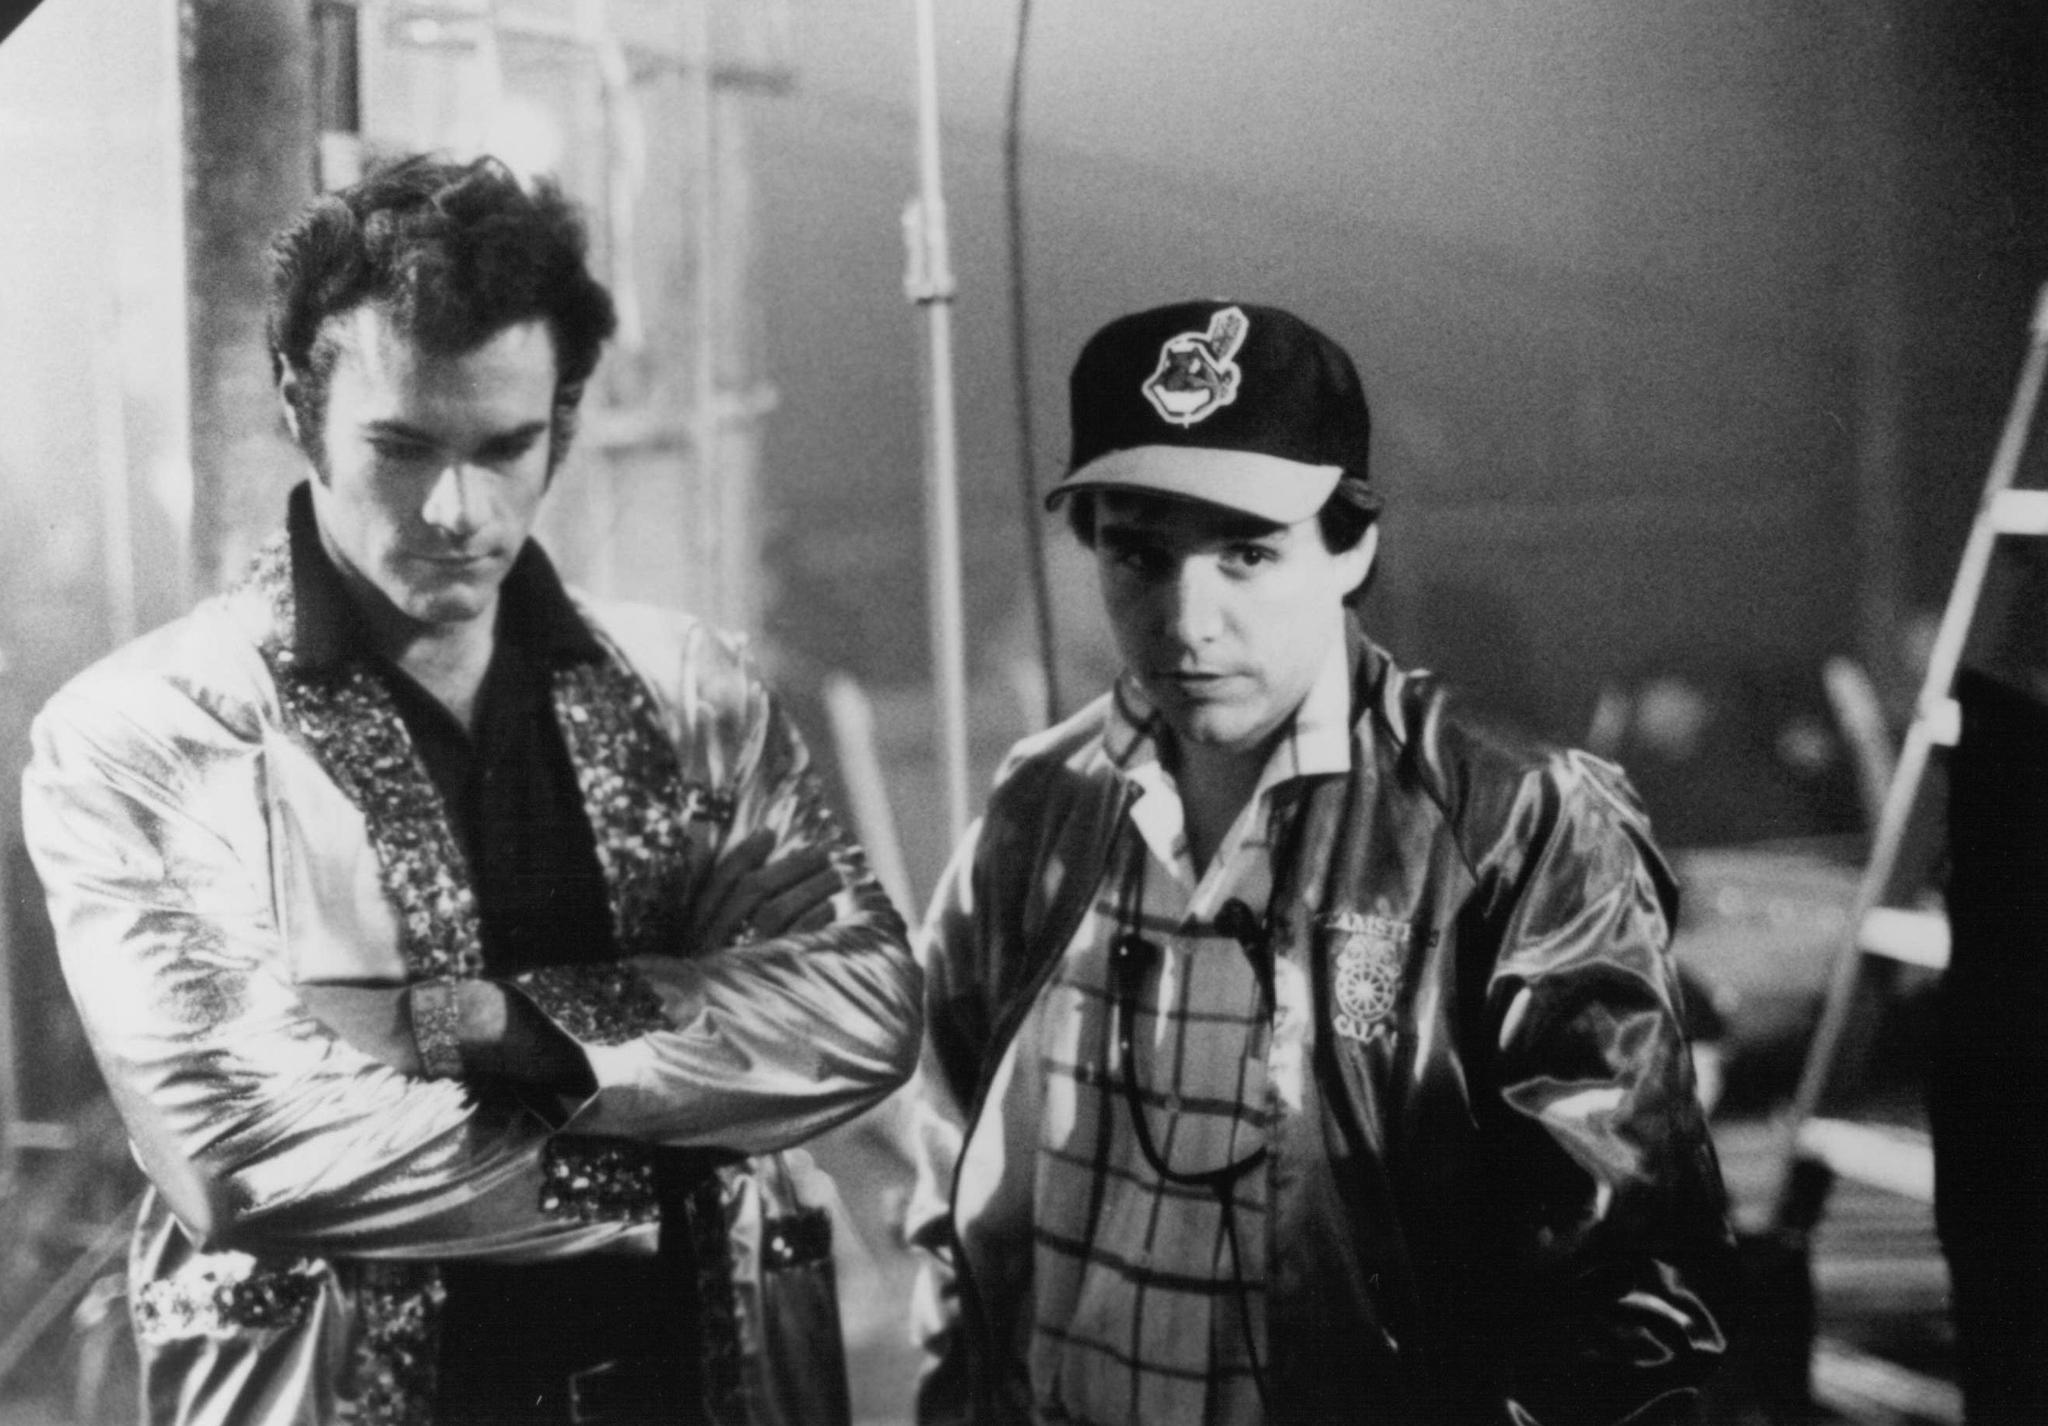 Chris Columbus and David Keith in Heartbreak Hotel (1988)